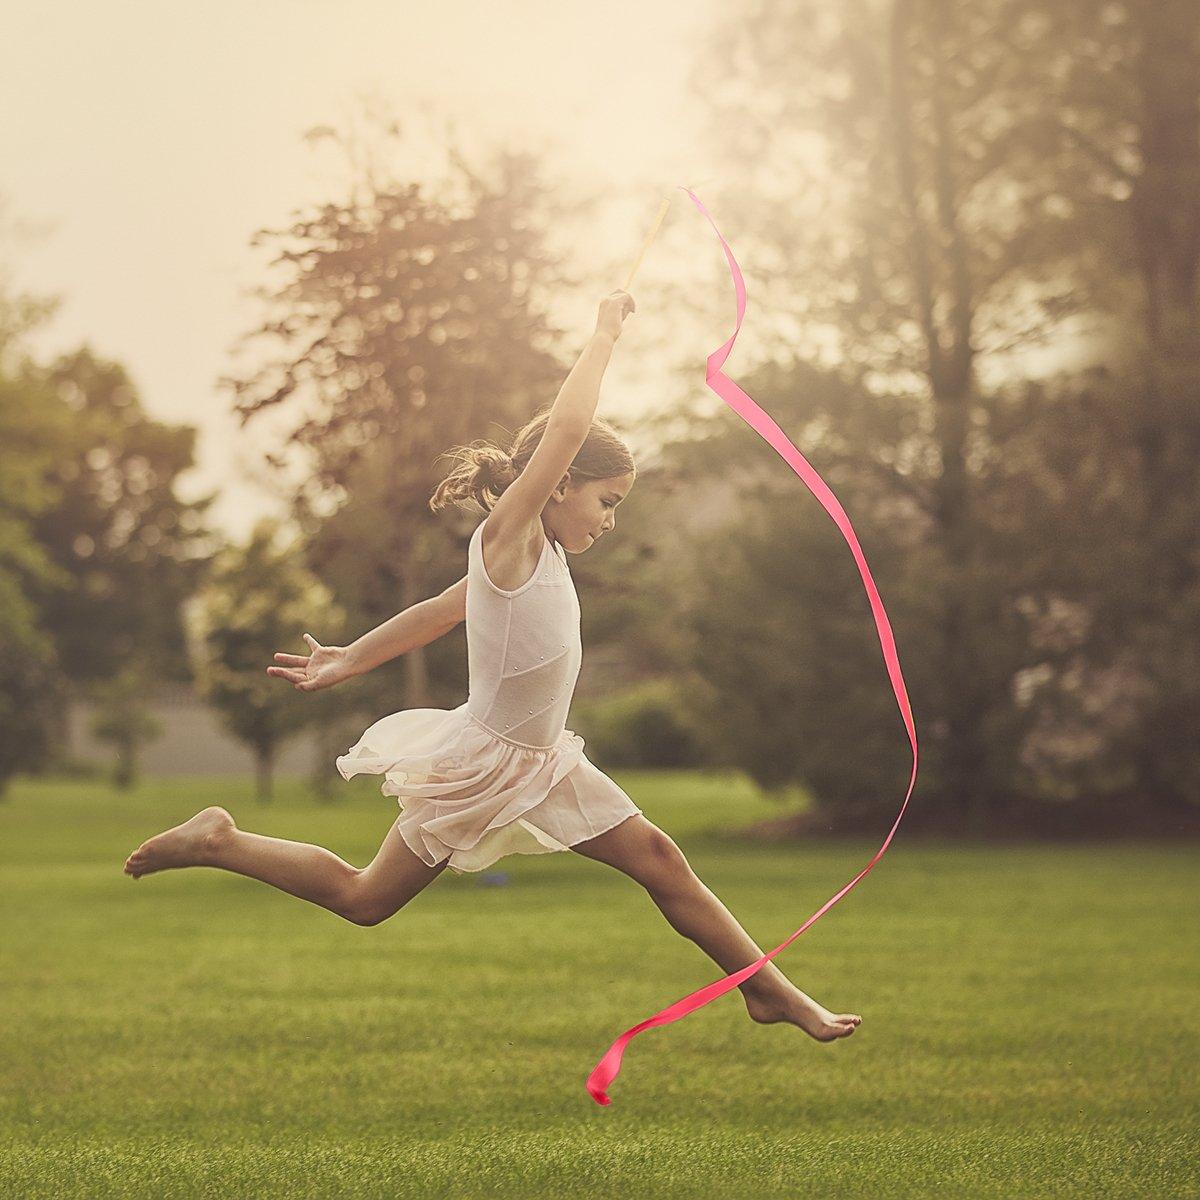 66 Rhythmic Artistic Twirling Ribbons with Non-Slip Handle PAMASE 16 Packs Kids Dancing Gymnastics Ribbon Wands